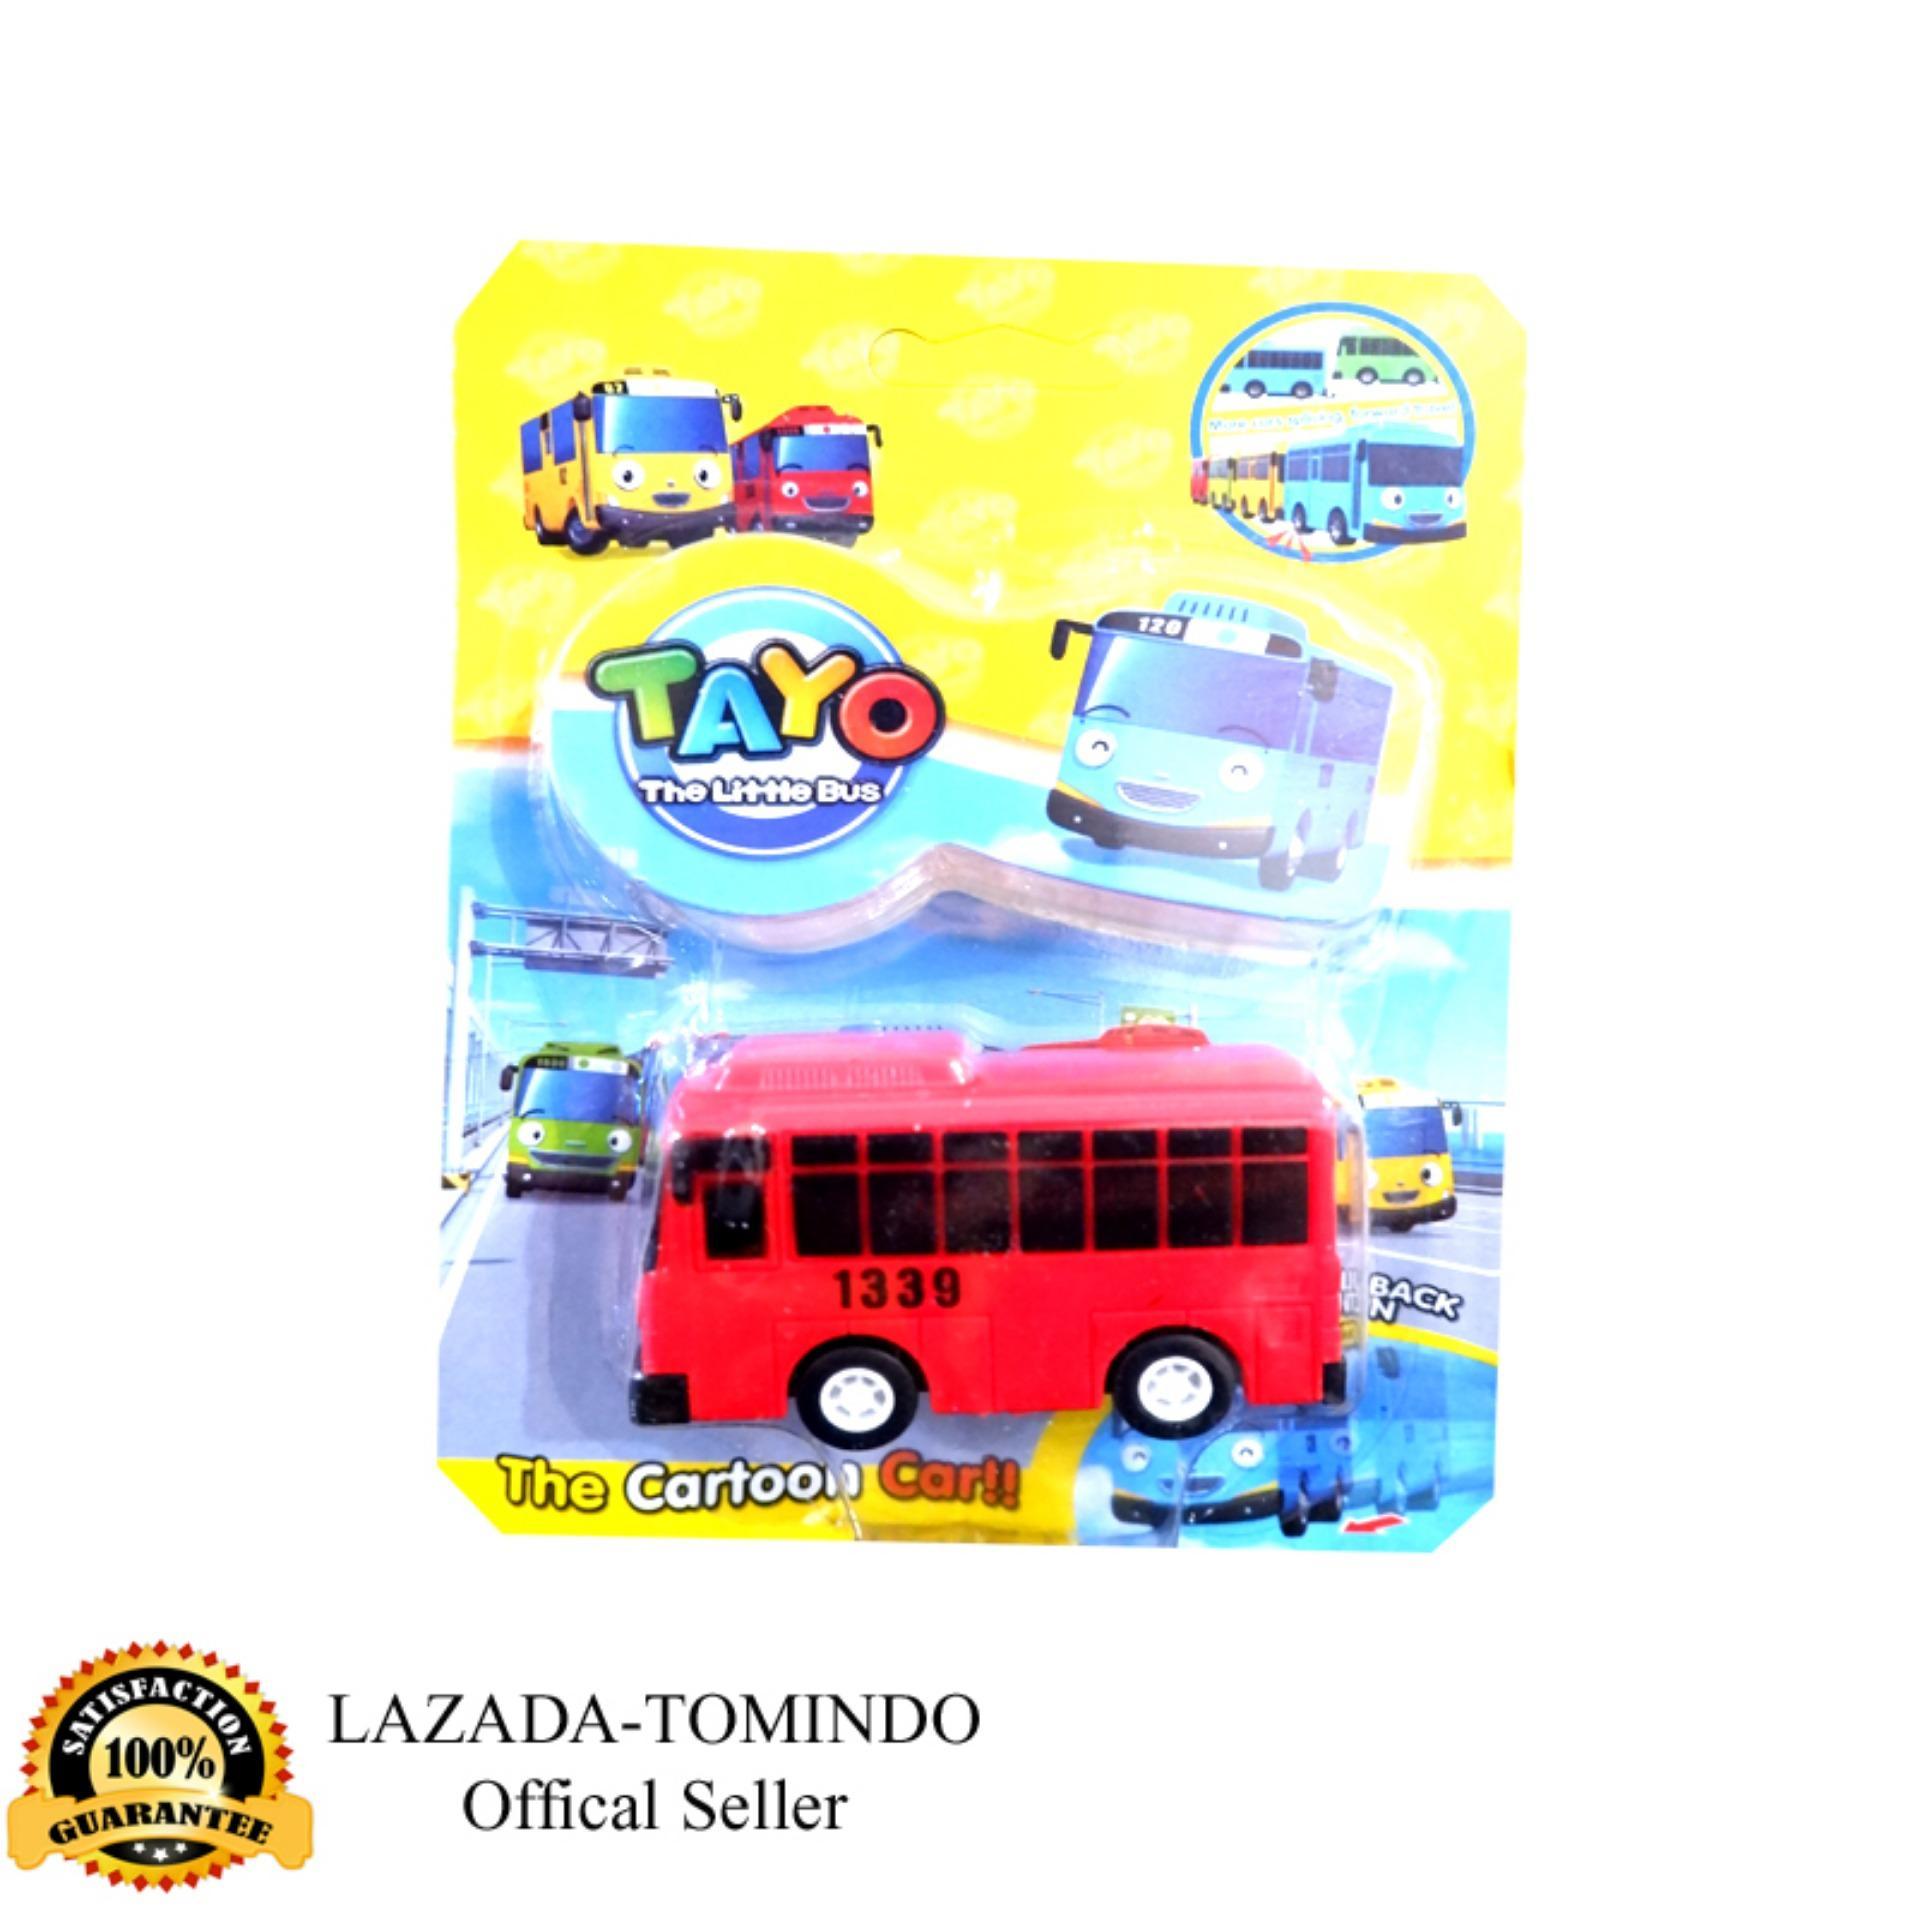 Cek Harga Baru Gani Tayo Bus Kecil Mainan 118 Pcs Tumpukan Blok Katalog Anak Lelaki Tomindo Toys The Little Merah 333 005 Pull